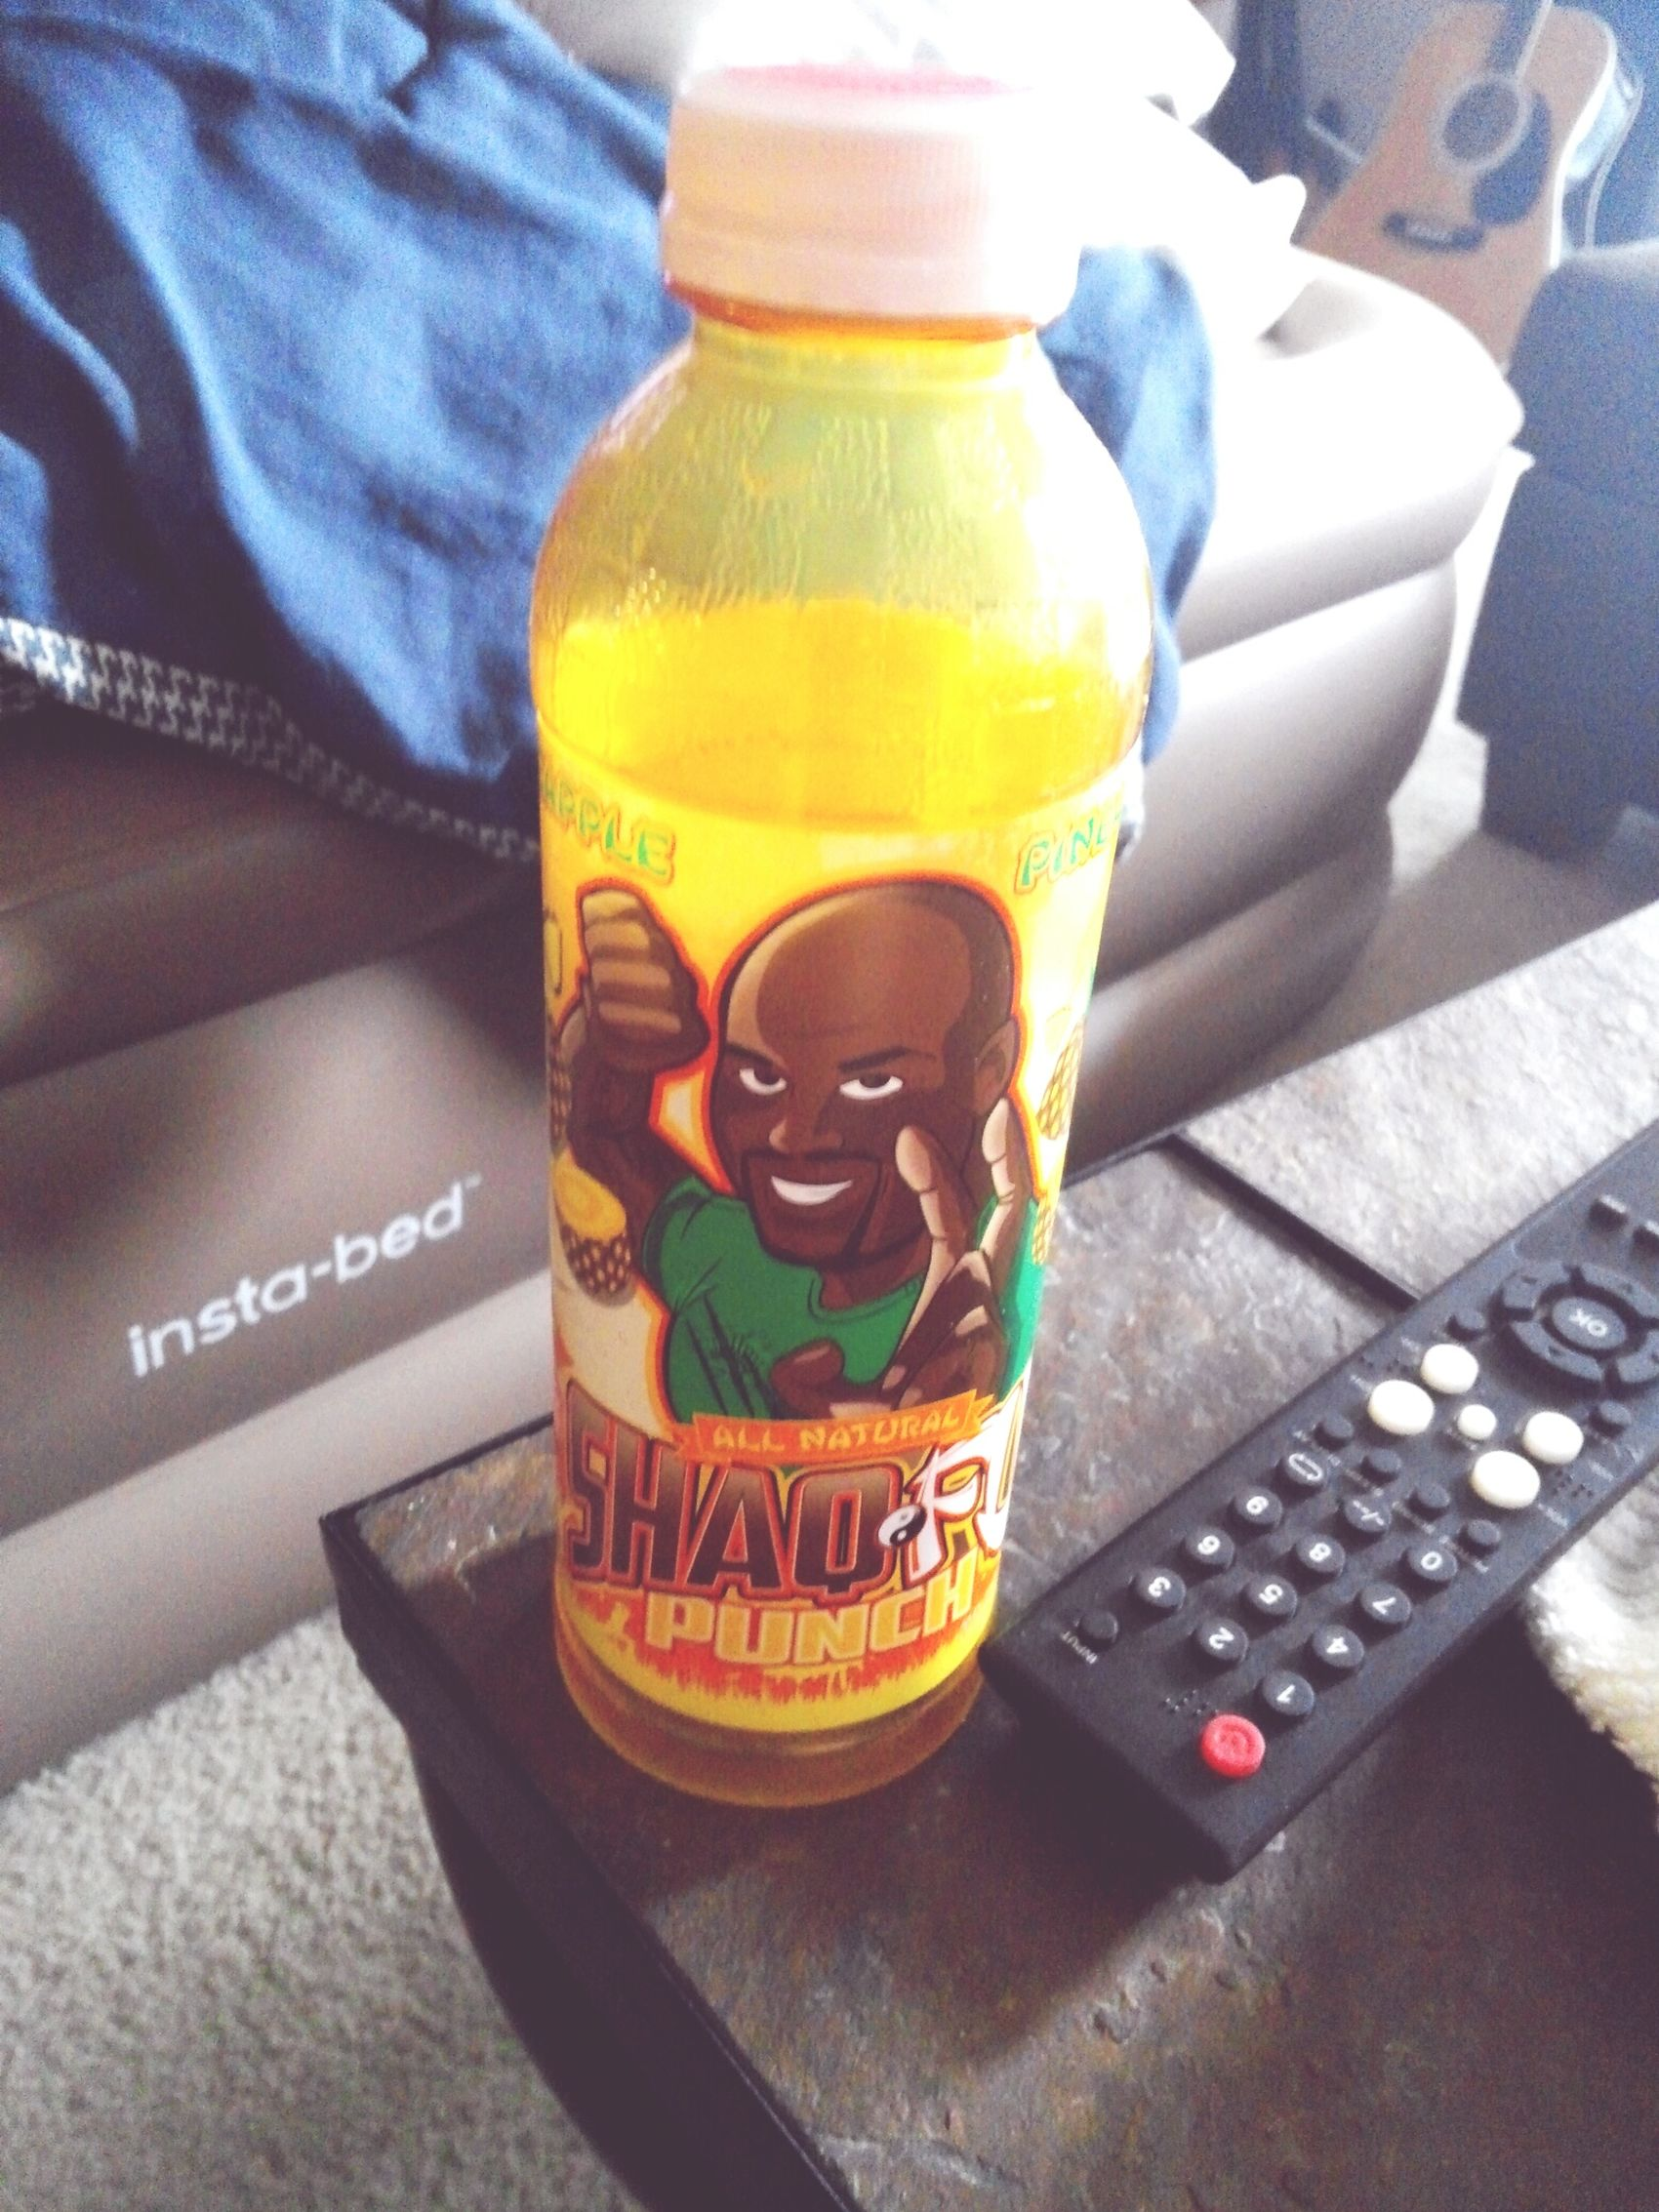 Found this gem last night at a gas station. I HAD to buy it of course. Shaq Shaqfu Arizona Tea Juice